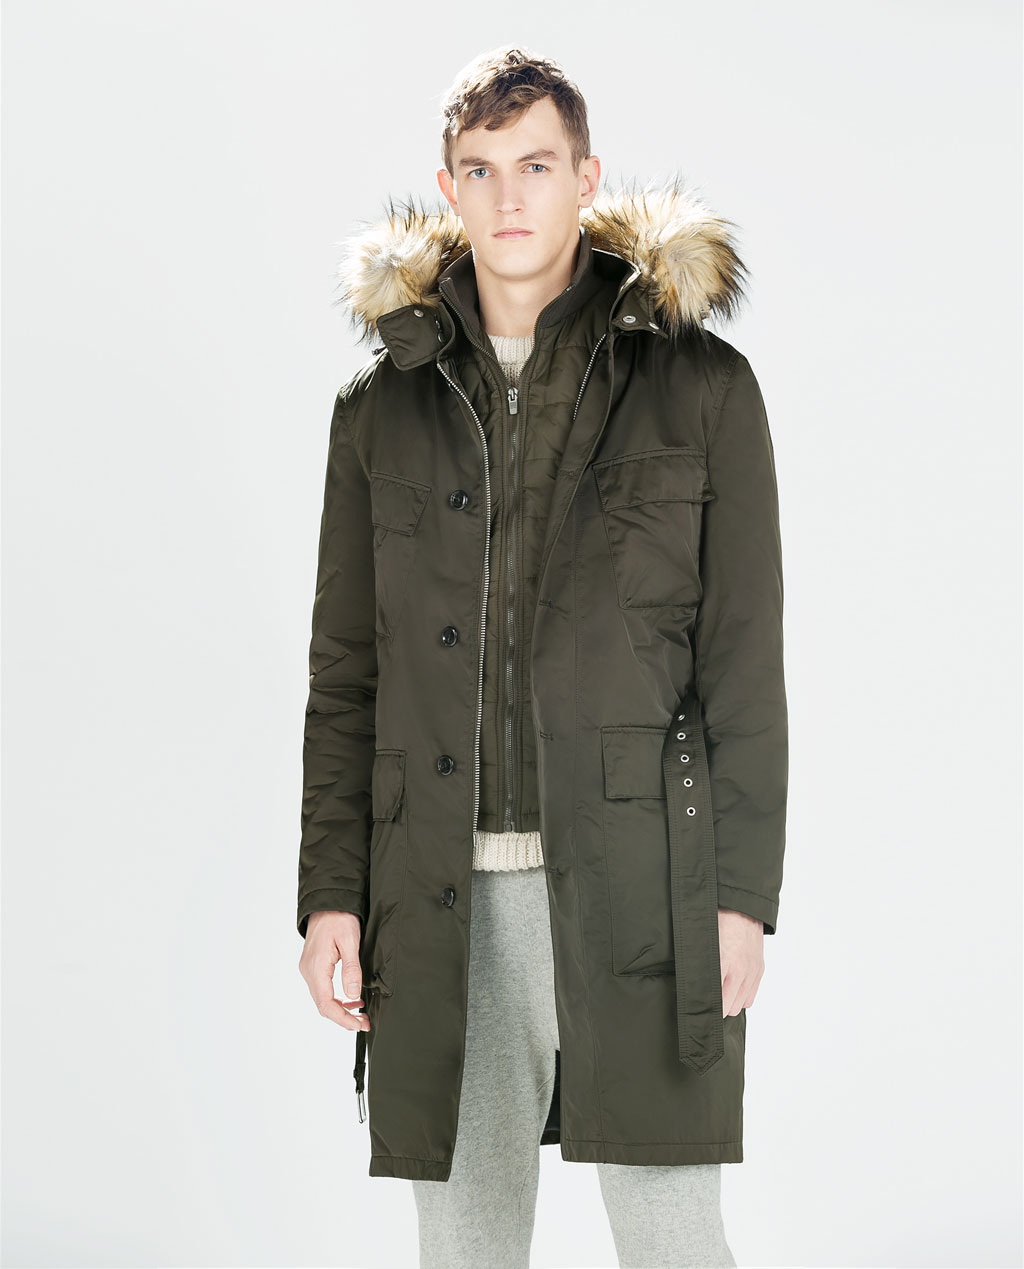 28bce5915 Zara man winter jacket 2015 – Modiga jackor